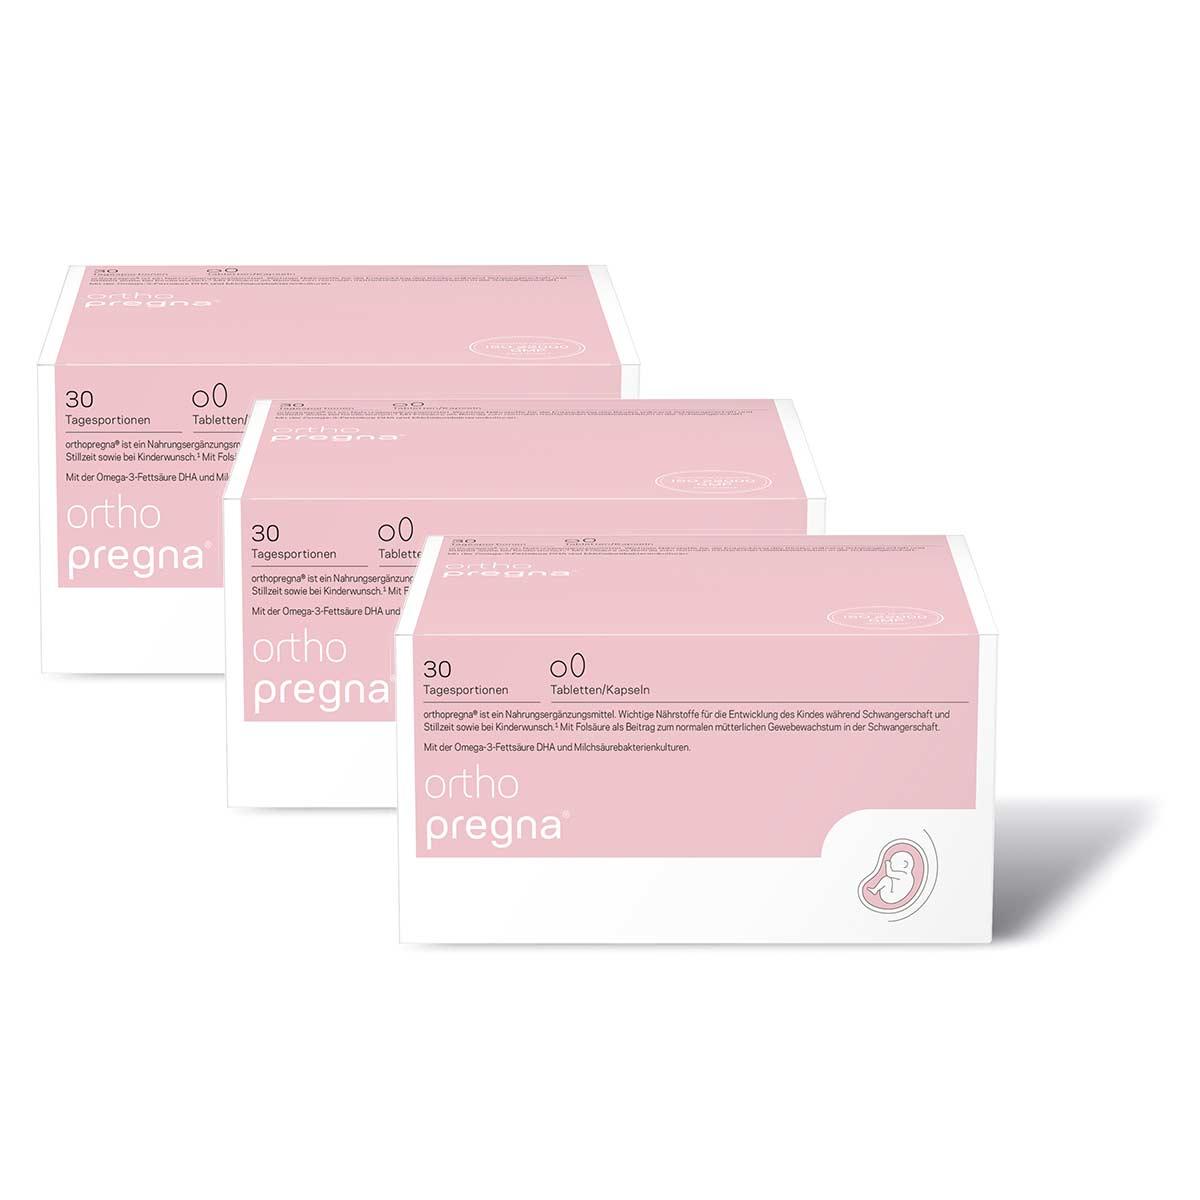 orthomol orthopregna 3x 30er Tabletten und Kapseln